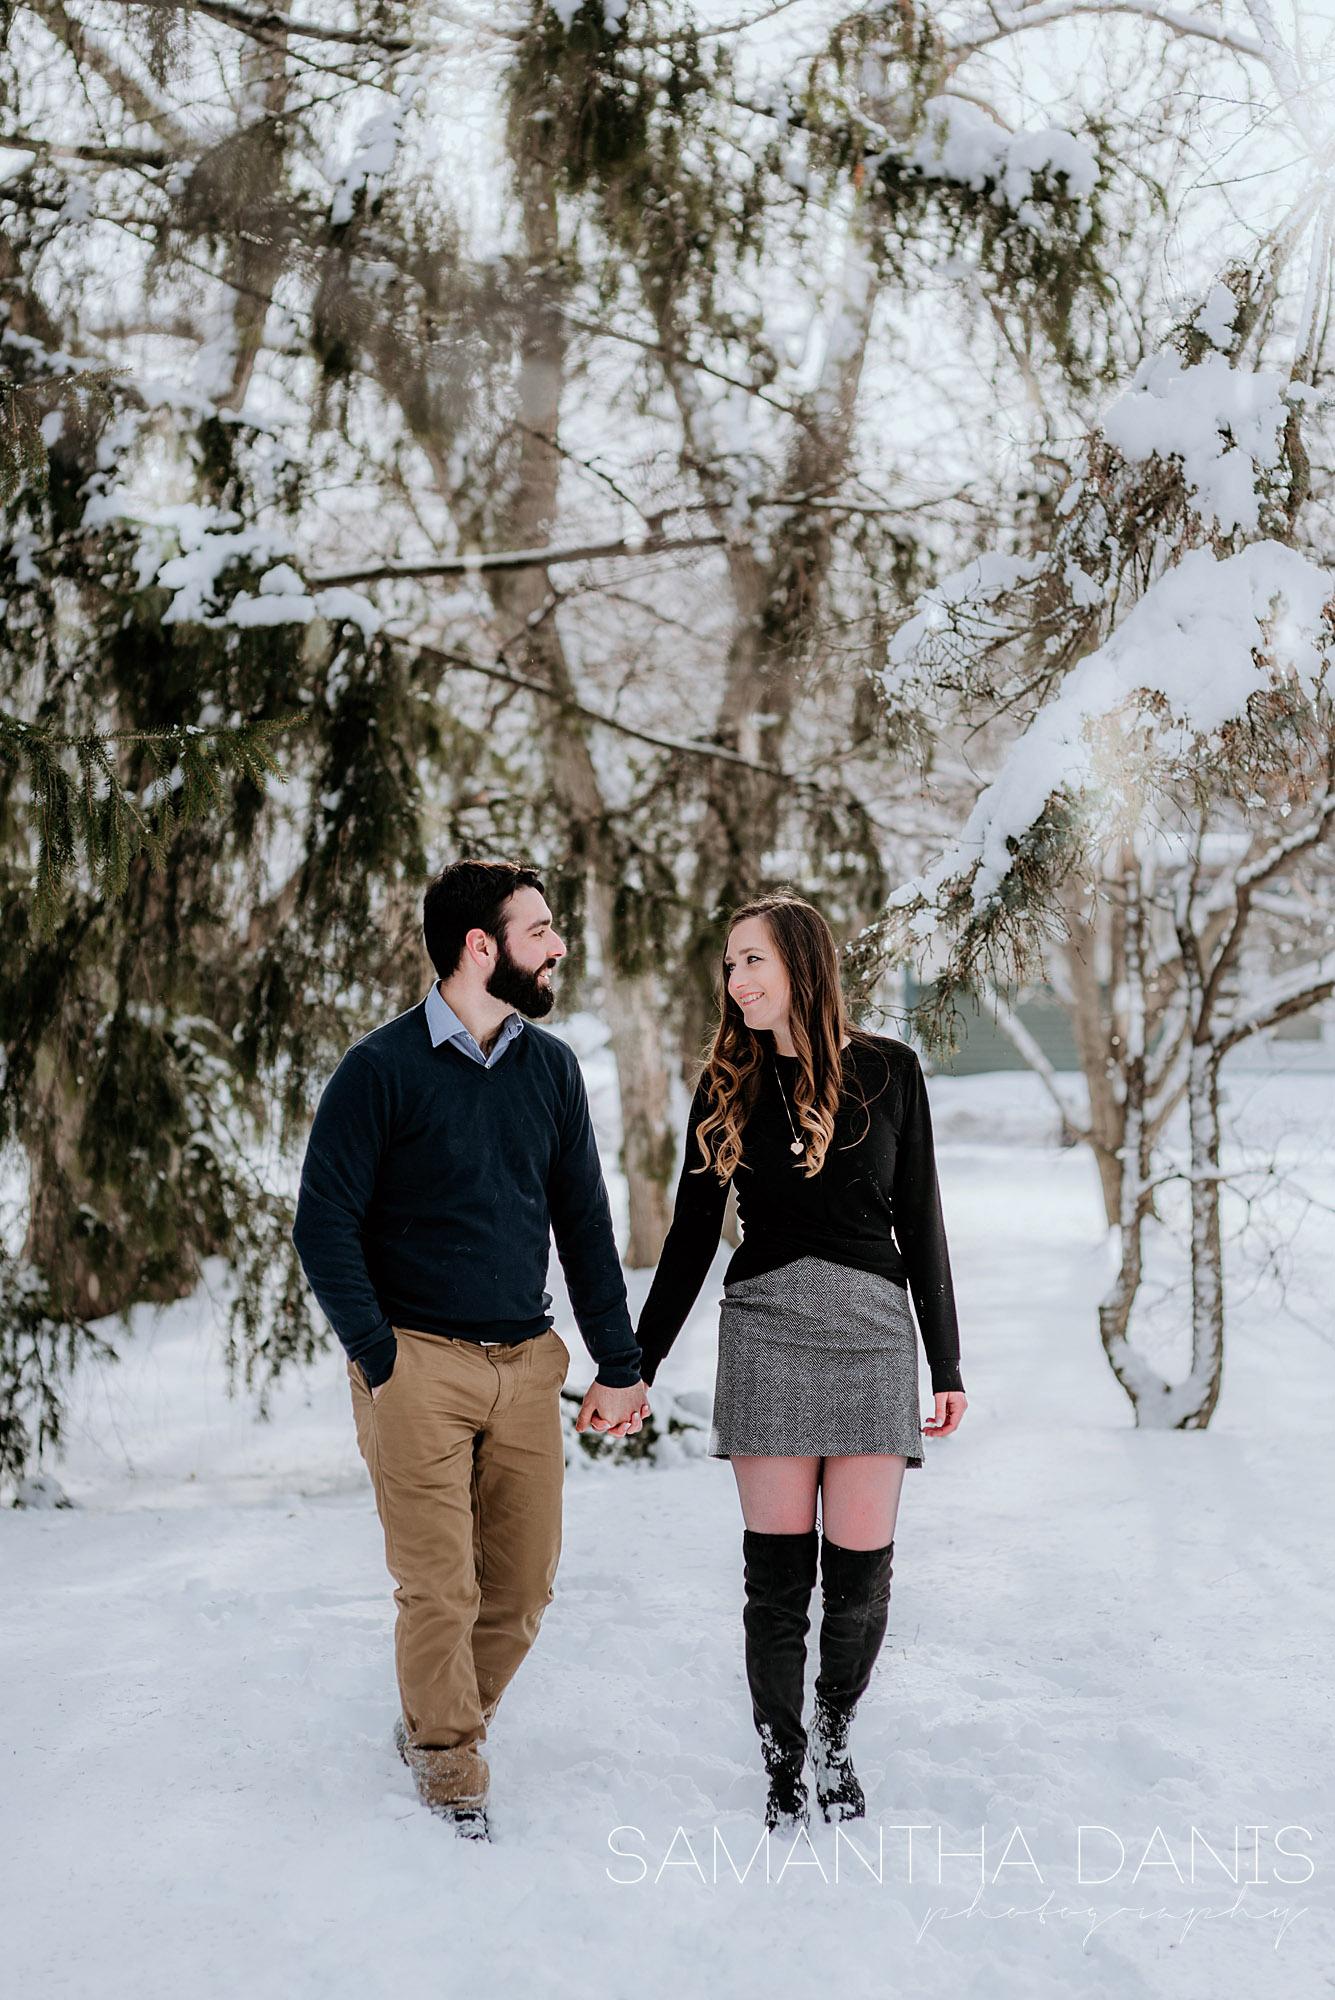 Ottawa wedding photographer samantha danis photography engaged in ottawa